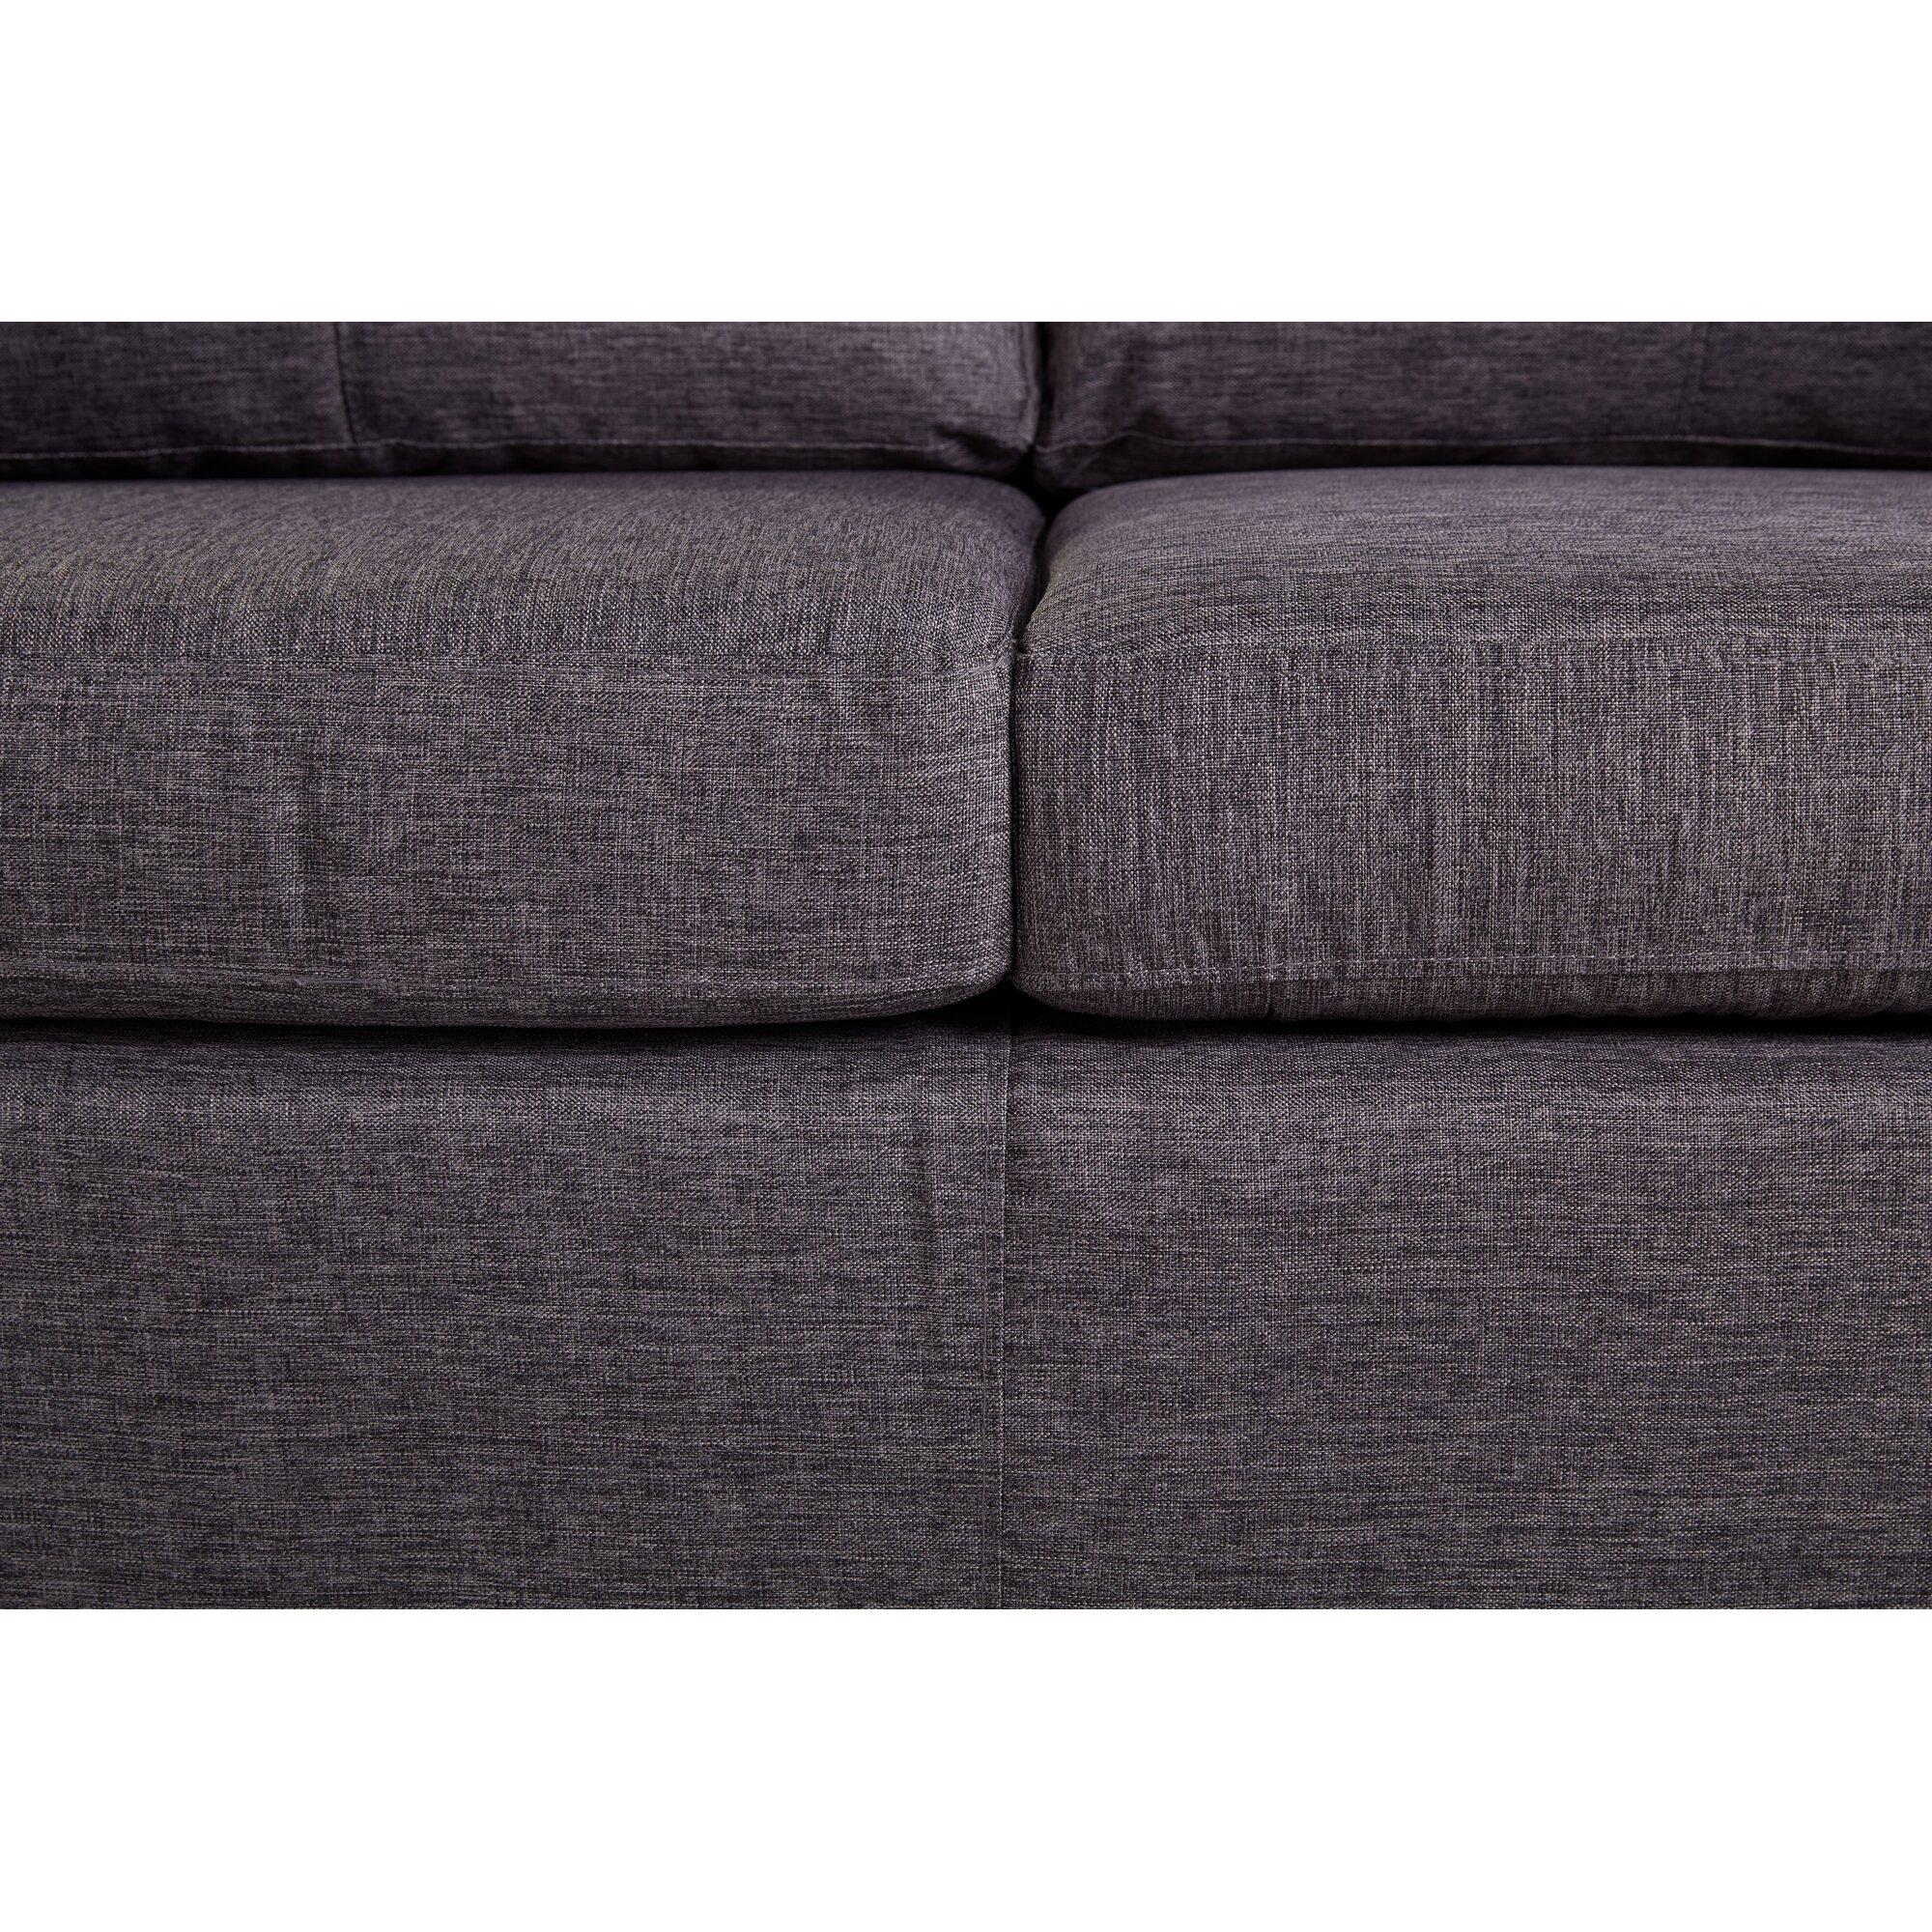 leader lifestyle 3 sitzer sofa oxford bewertungen. Black Bedroom Furniture Sets. Home Design Ideas